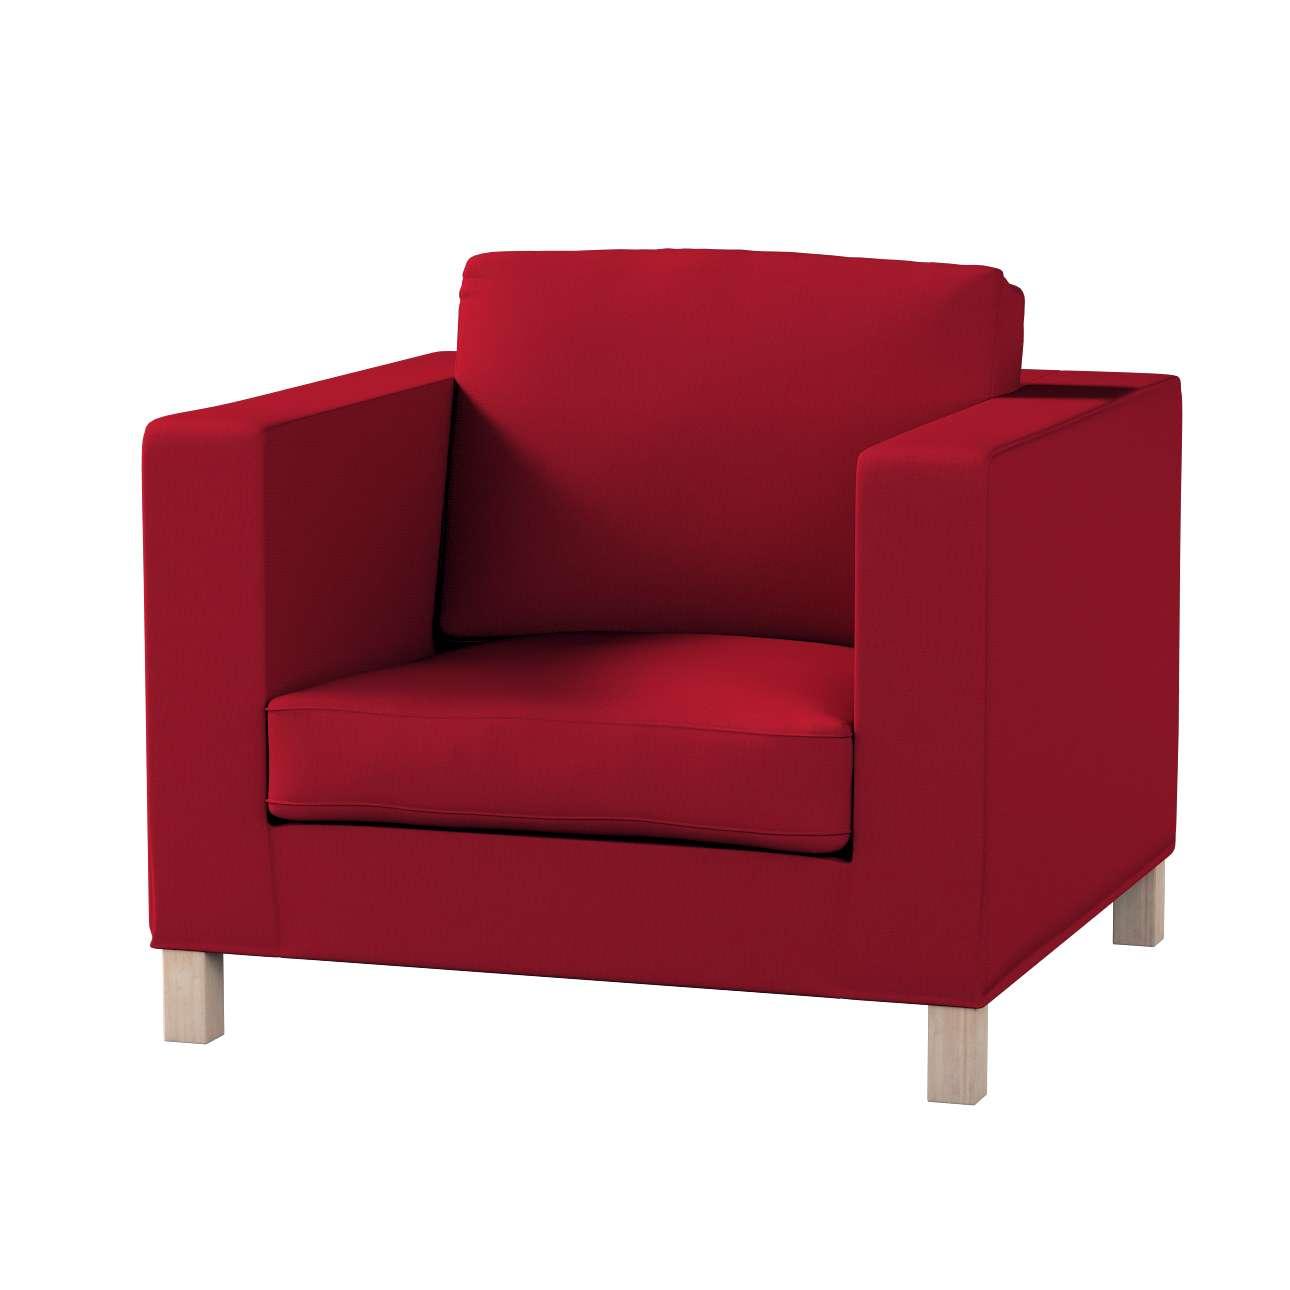 Pokrowiec na fotel Karlanda, krótki fotel Karlanda w kolekcji Etna , tkanina: 705-60